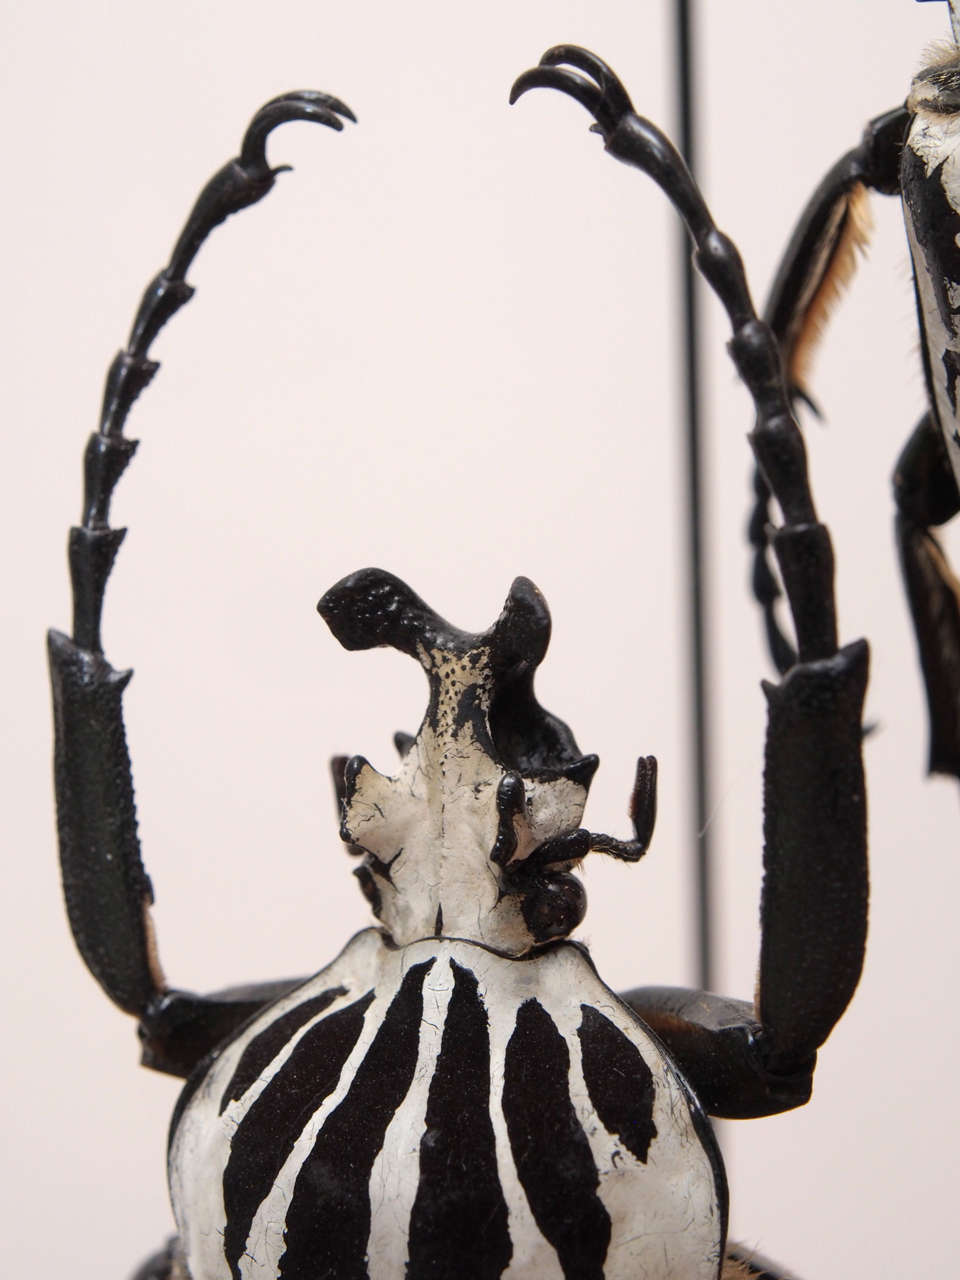 Specimen Beetles Under Glass Dome 5